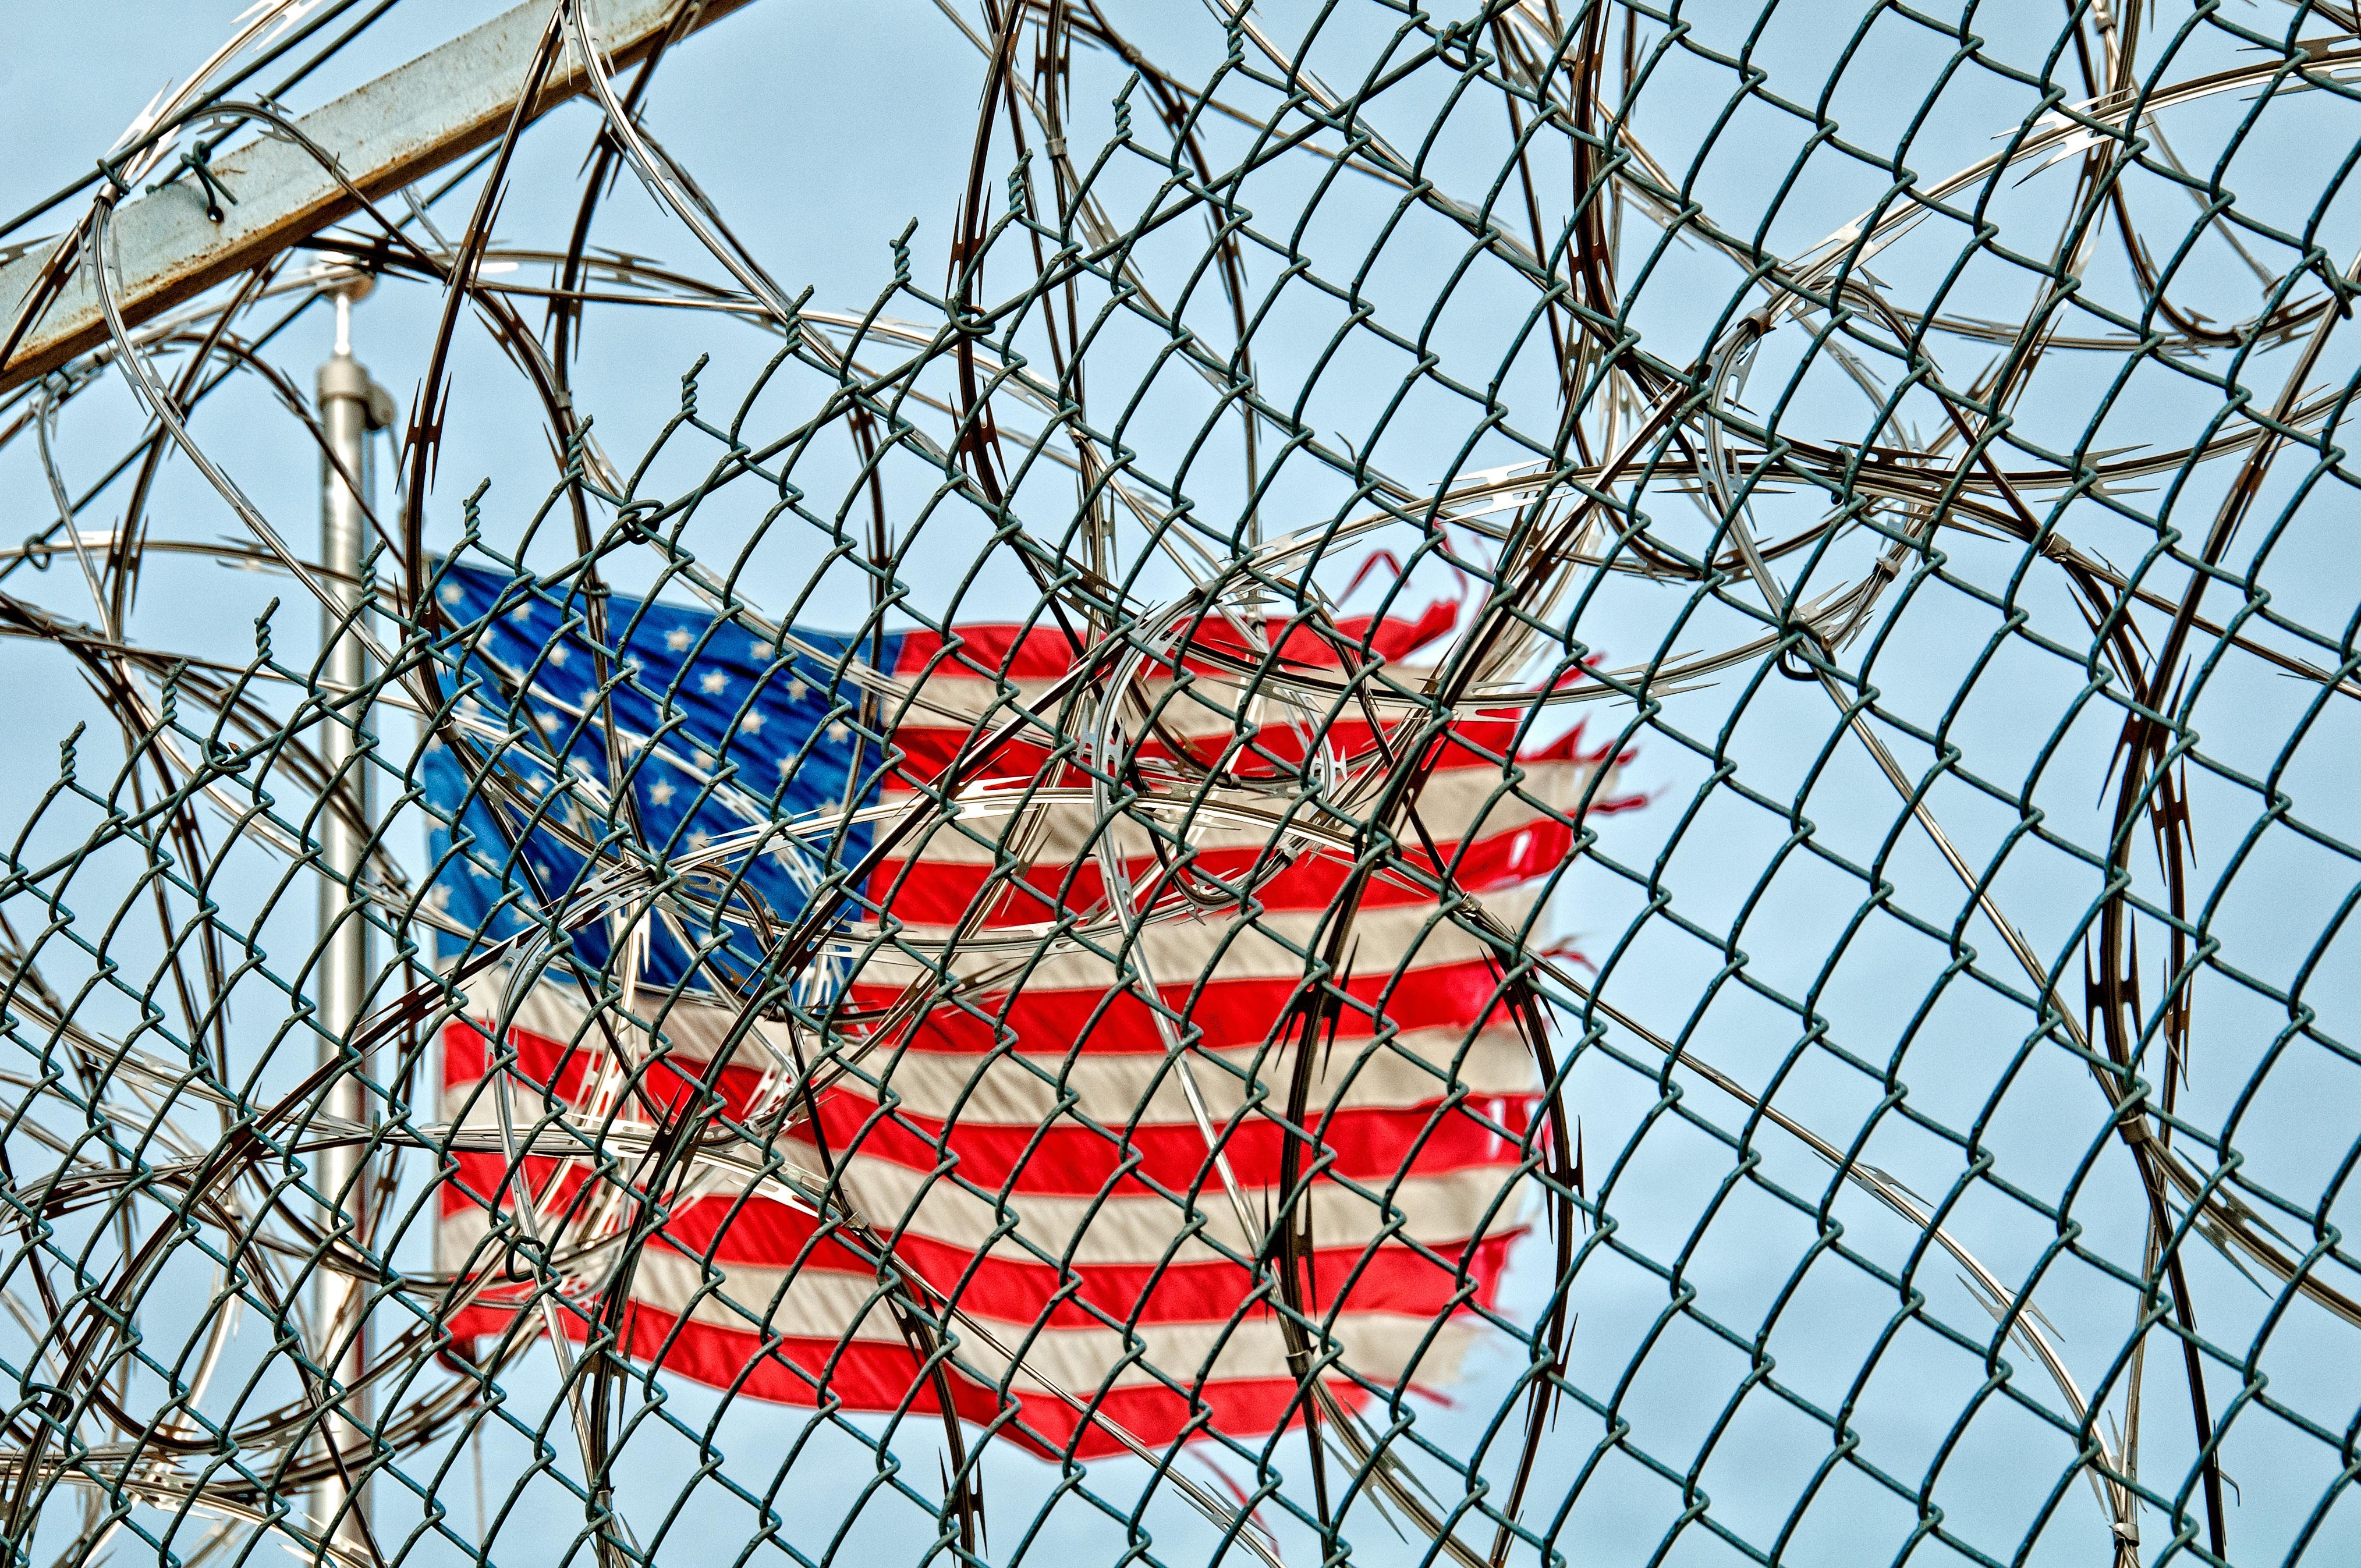 Wallpaper : barbed wire, flag, fence, scaffolding, ART, net, line ...